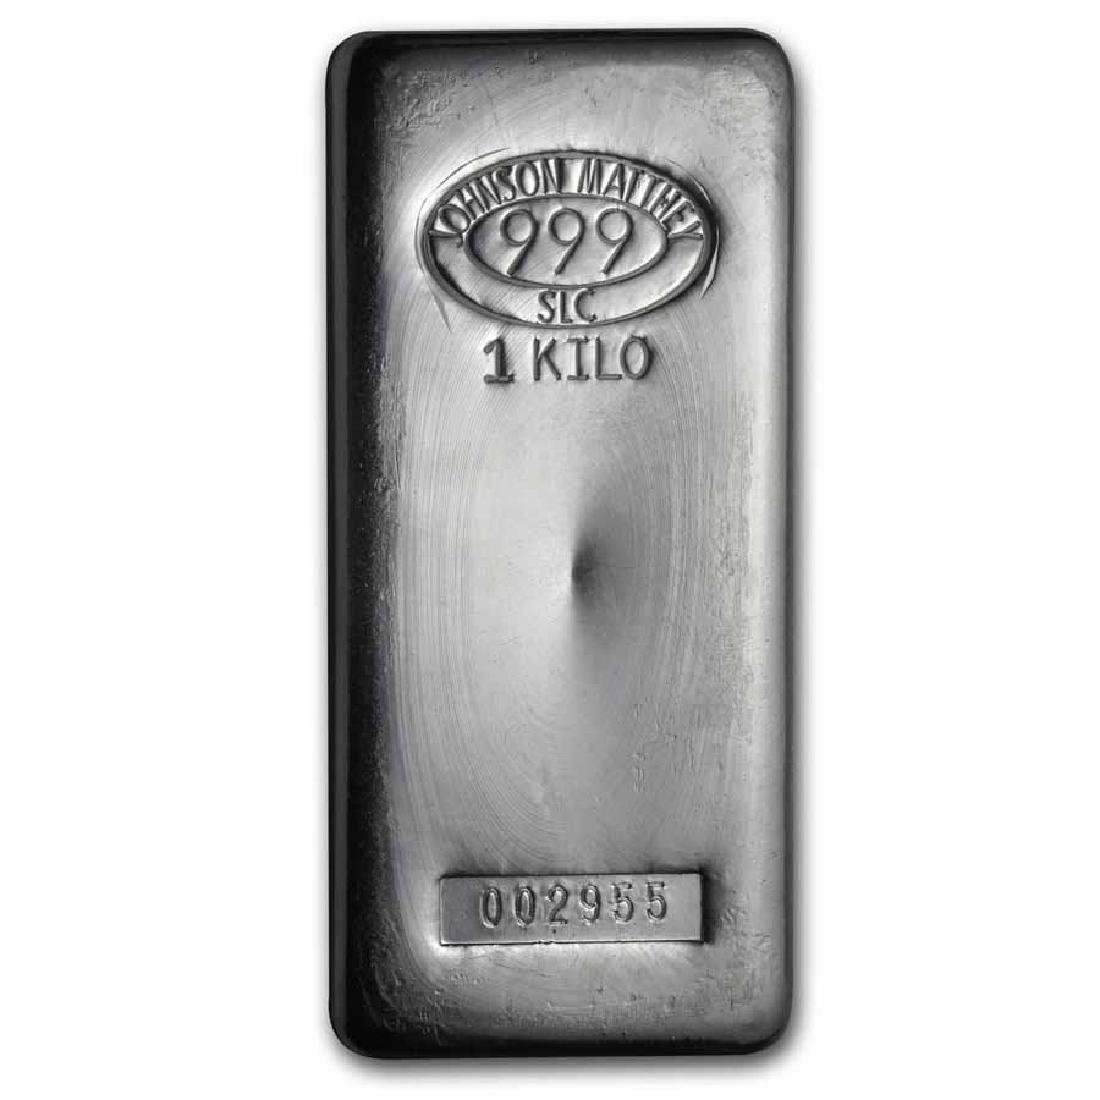 Johnson Matthey 1 Kilo Silver Bar (32.15 oz)